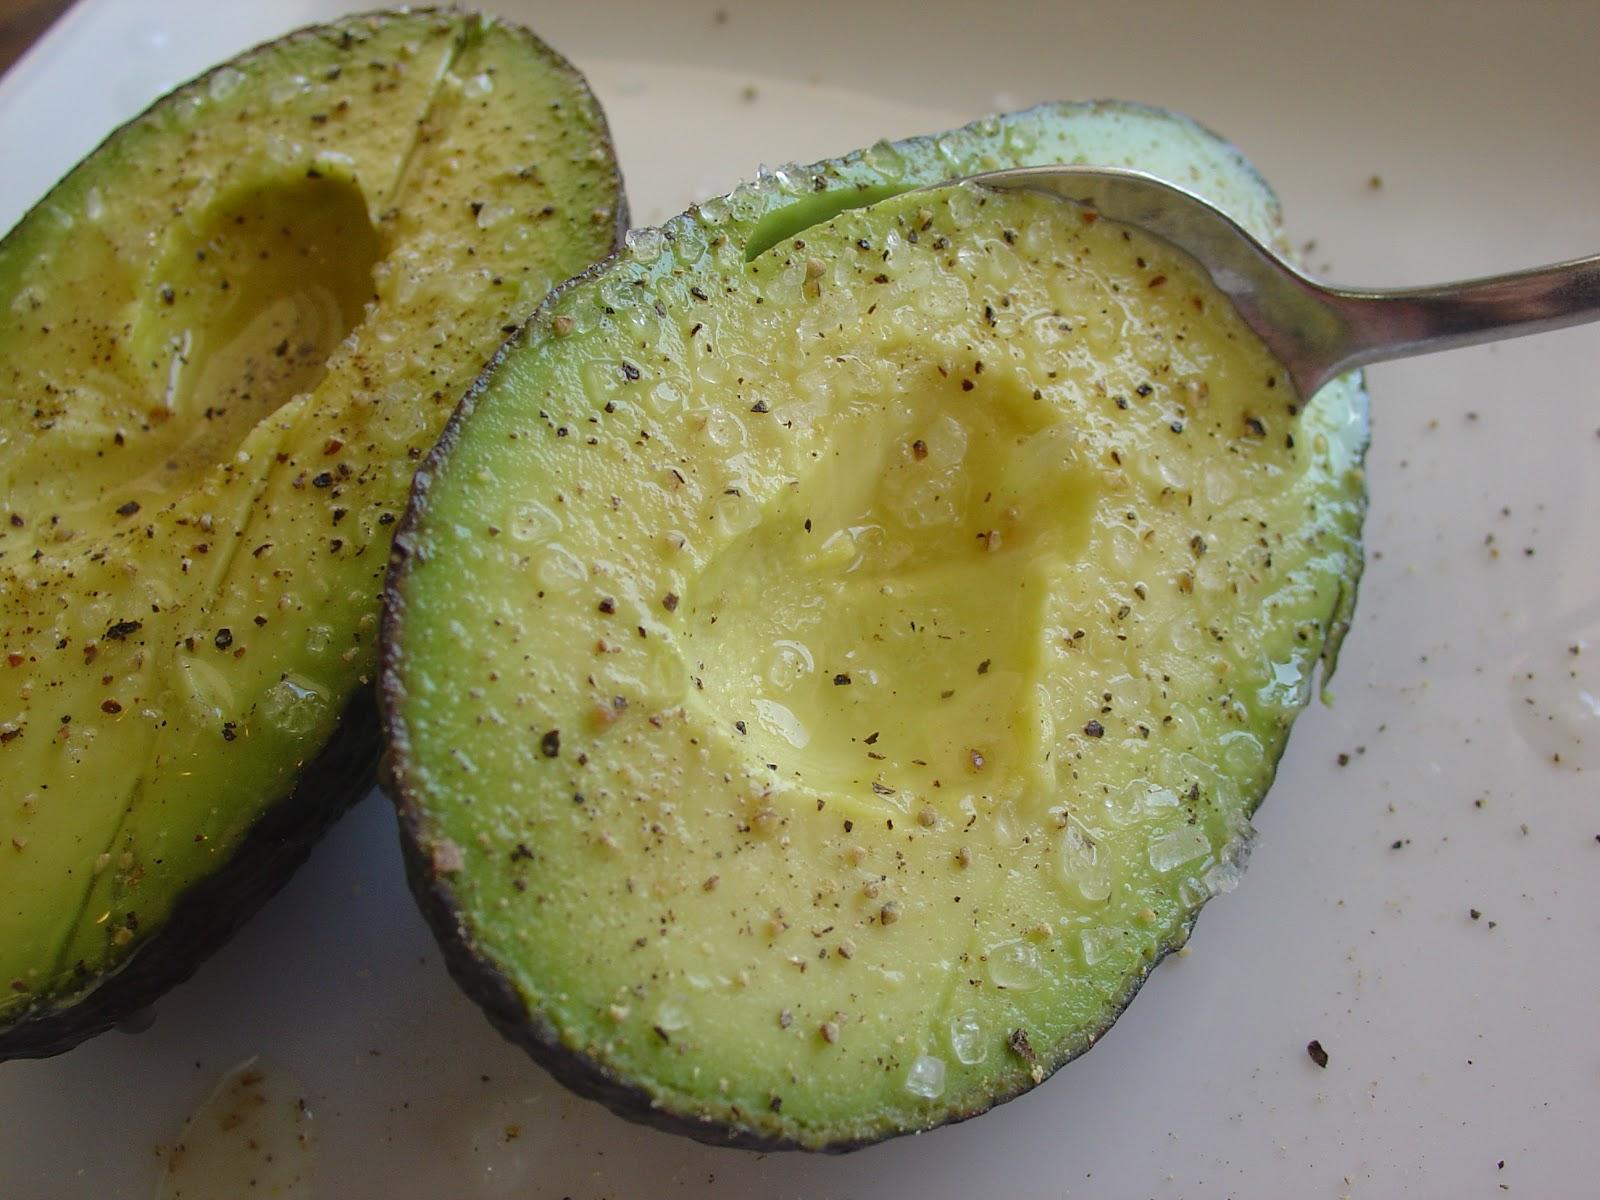 Healthy Avocado Snacks Healthy Easy Snacks For Work